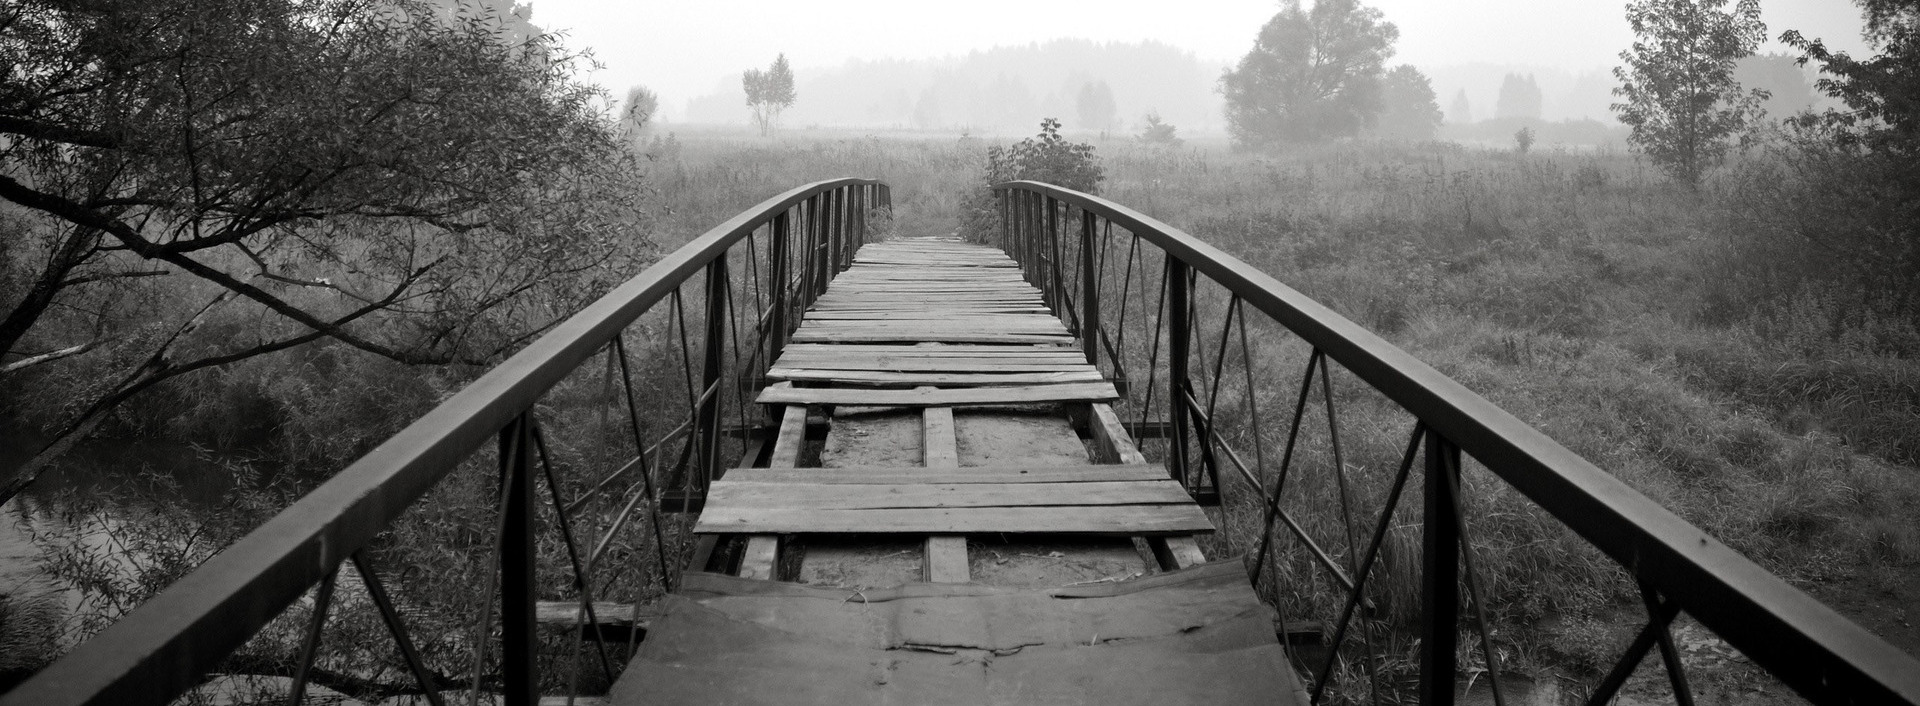 Abandoned-bridge-photography-hd-wallpaper-1920x1200-3783